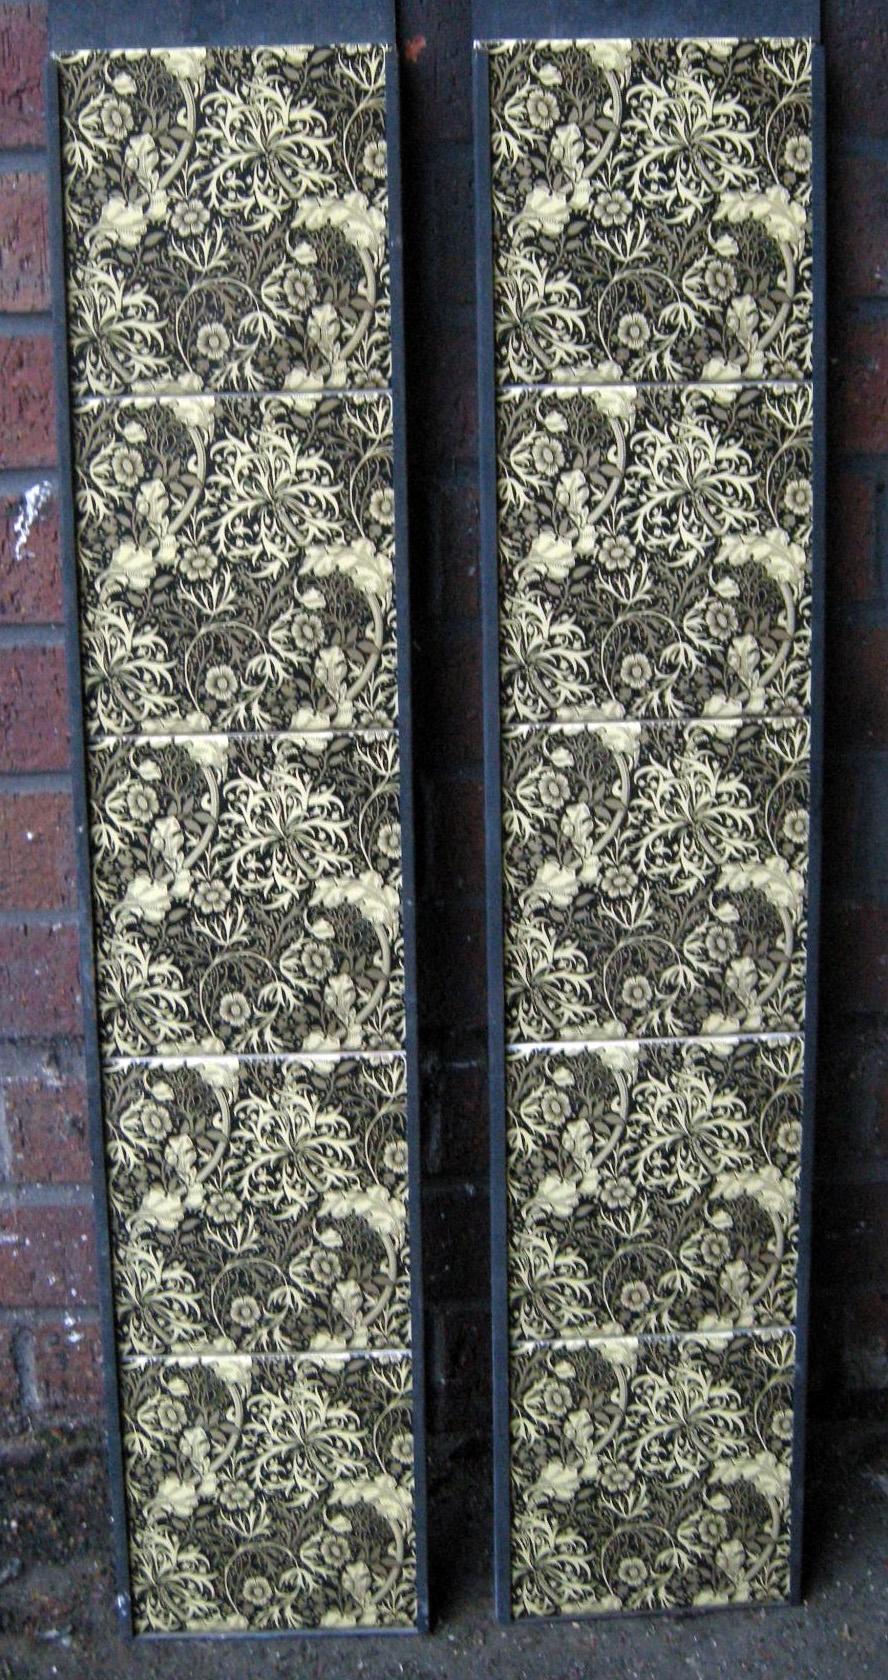 William Morris Seaweed Grey Arts & Crafts Tile Set